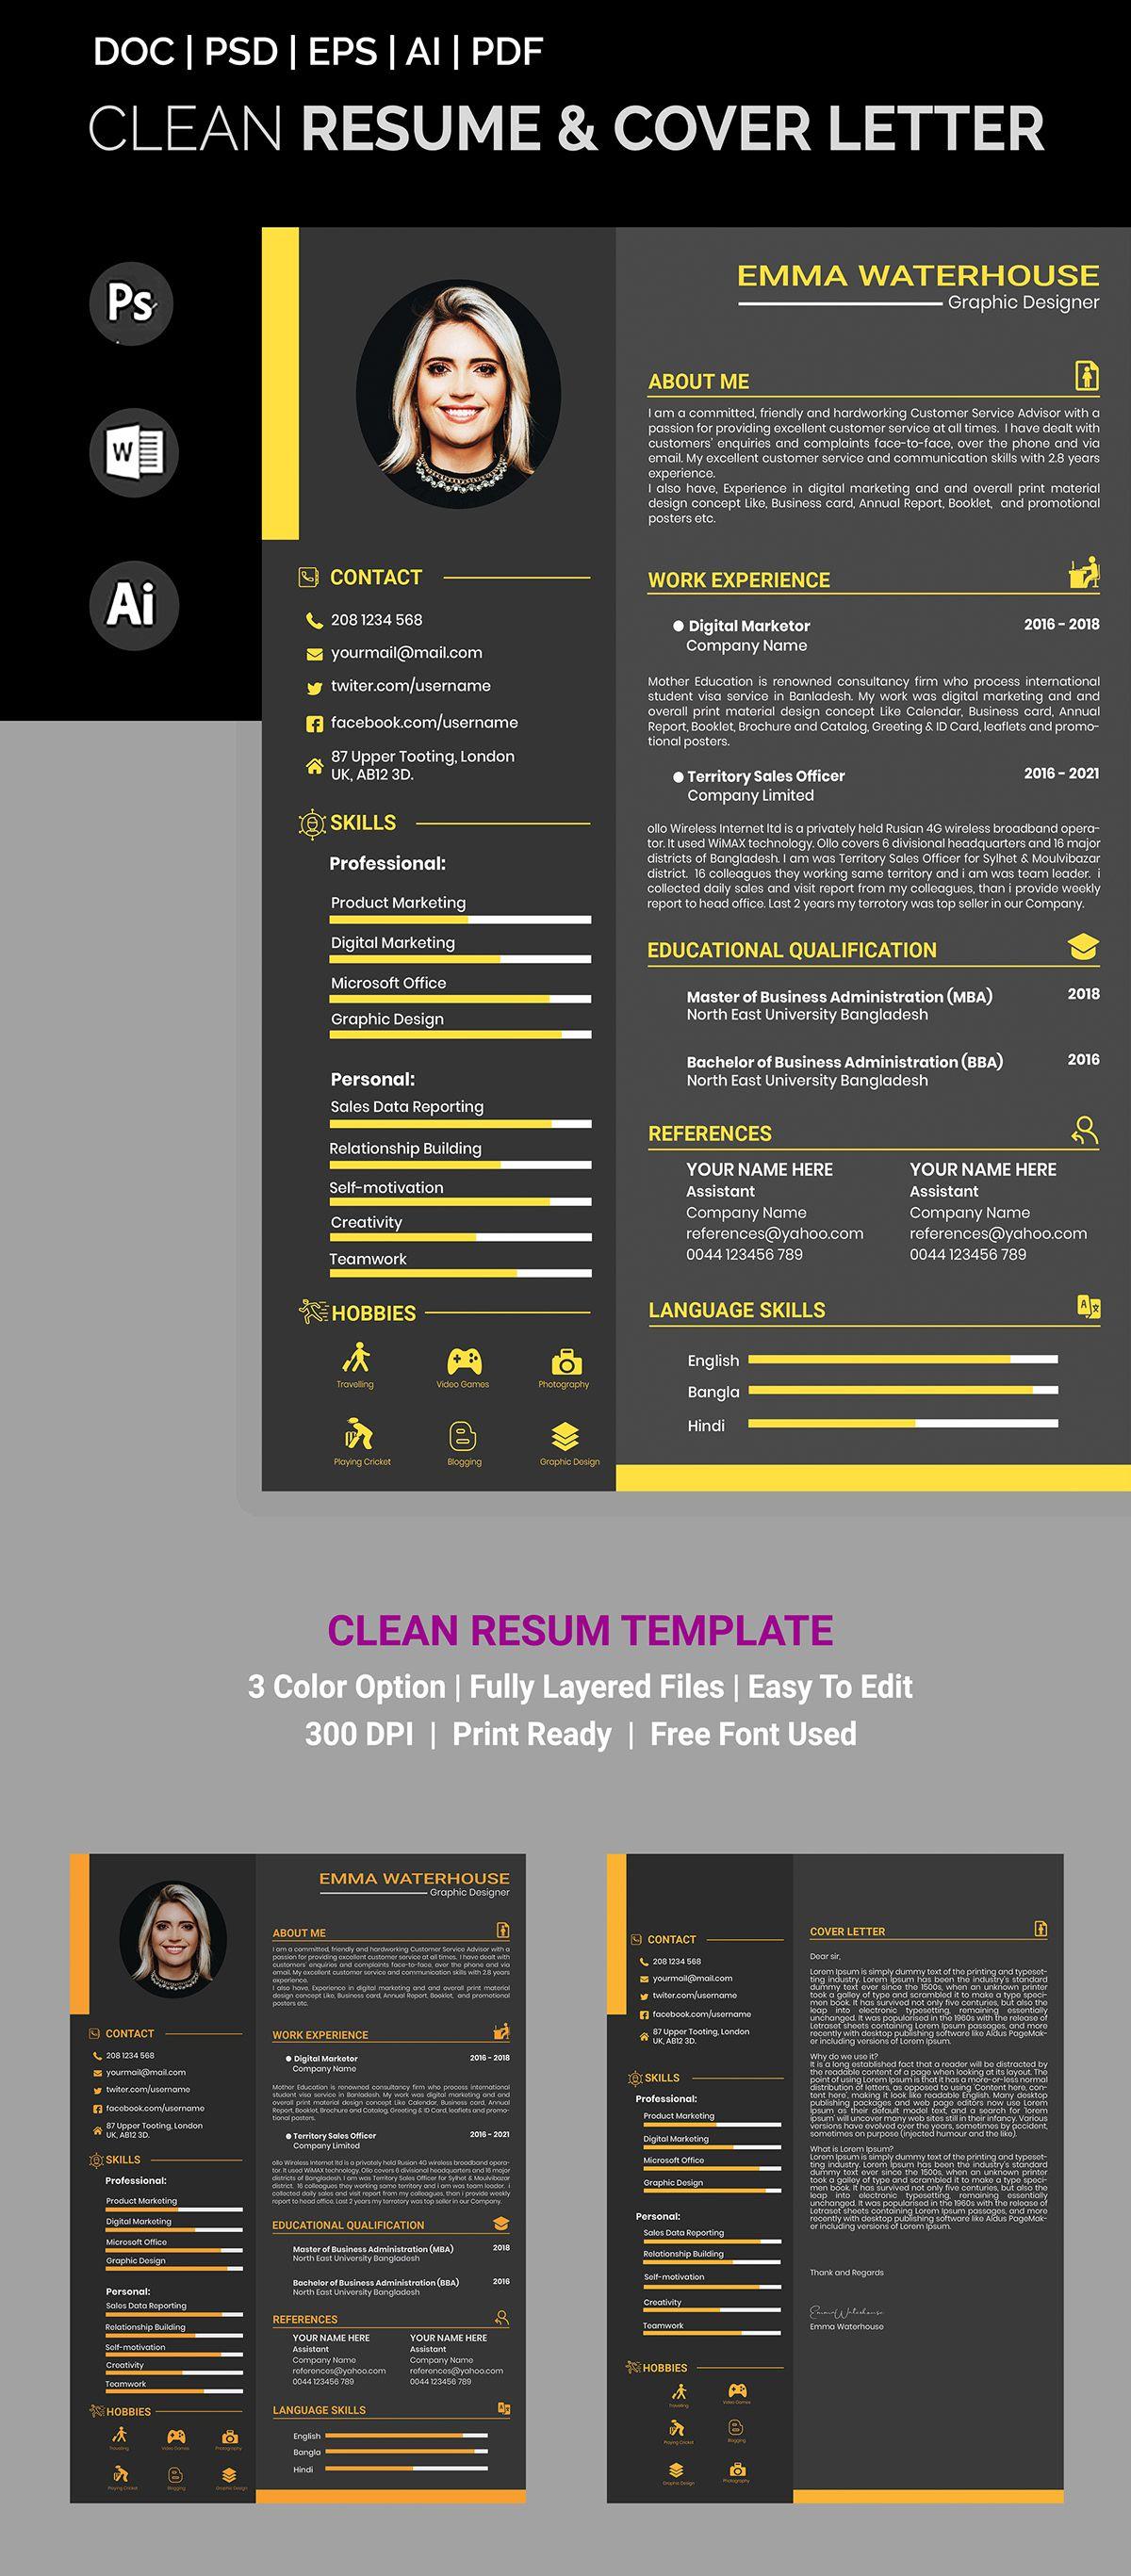 Professional Resume Cv Template On Behance Cv Template Cv Resume Template Cover Letter For Resume